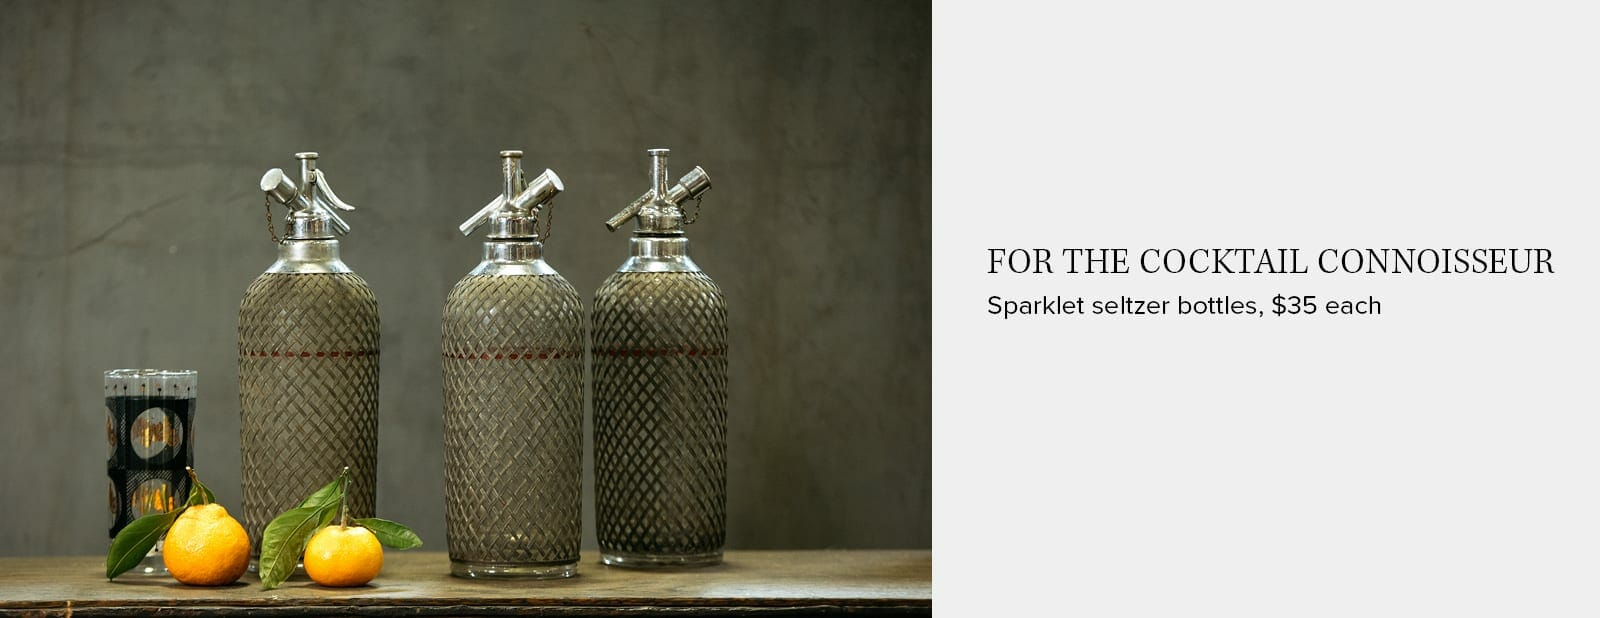 sparklets seltzer bottles